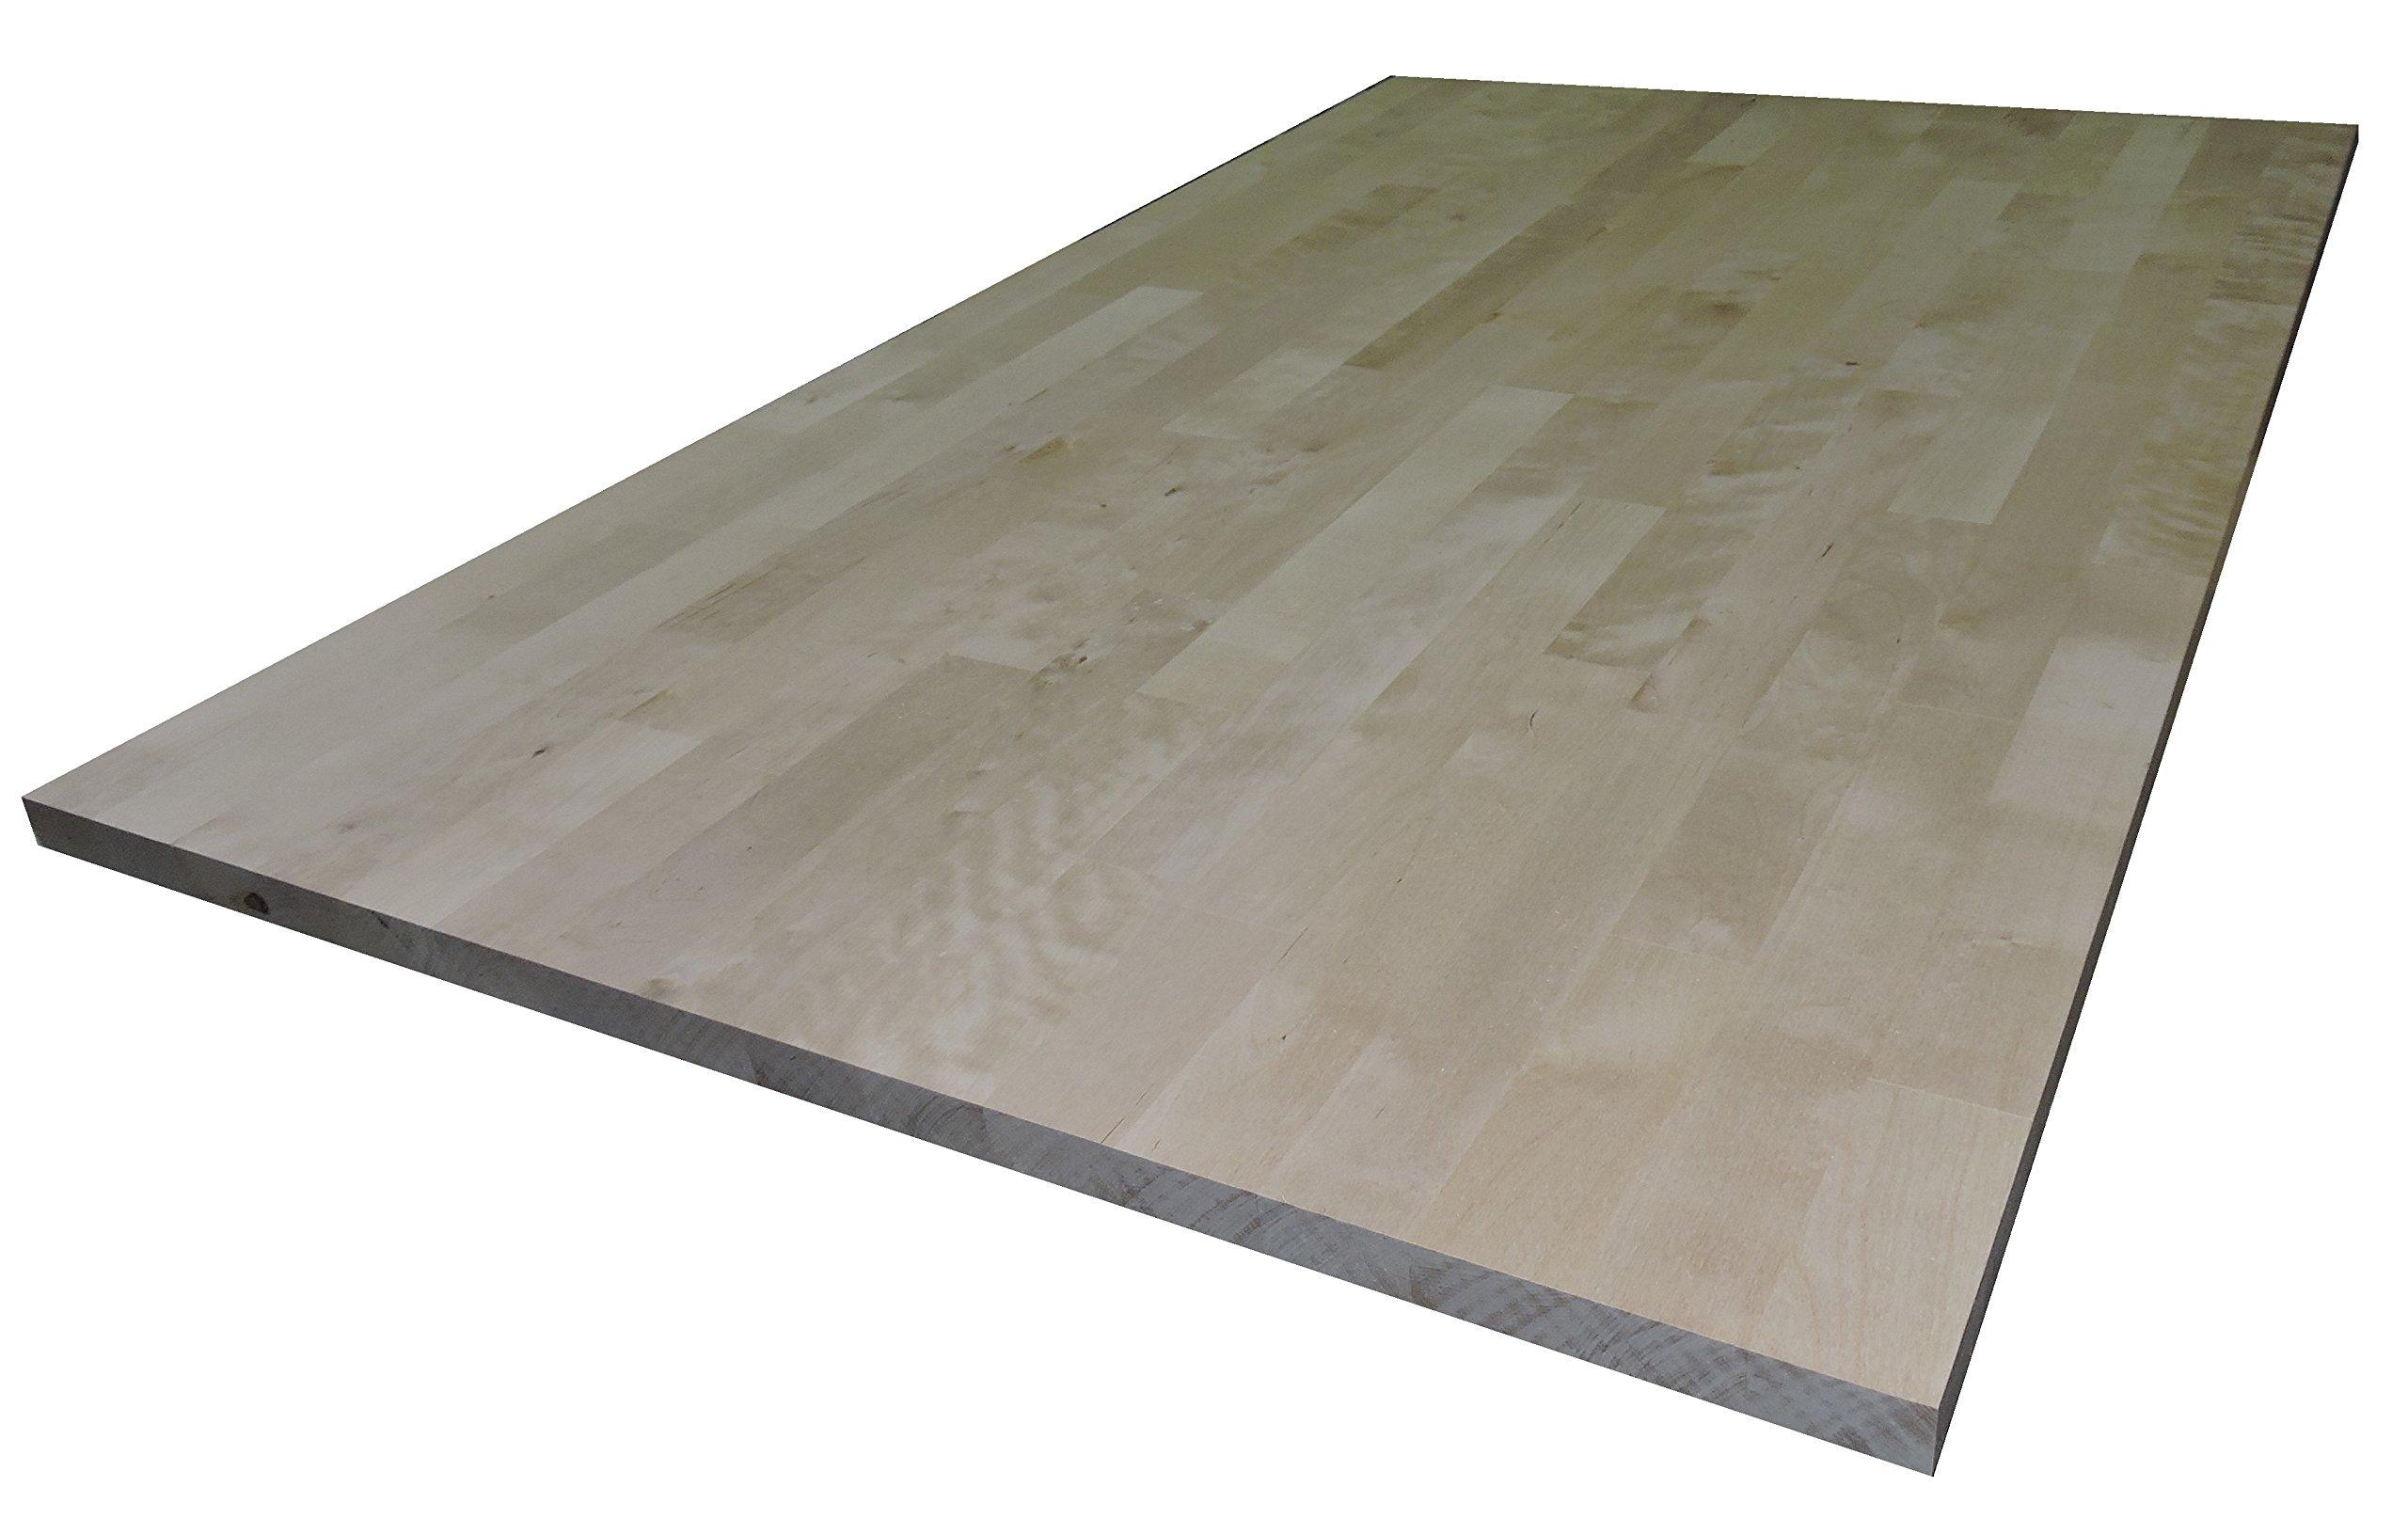 Allwood 1'' x 16'' x 29'' Birch Table/Counter/Island Top See All Edge Options (Sharp Edges) by Allwood